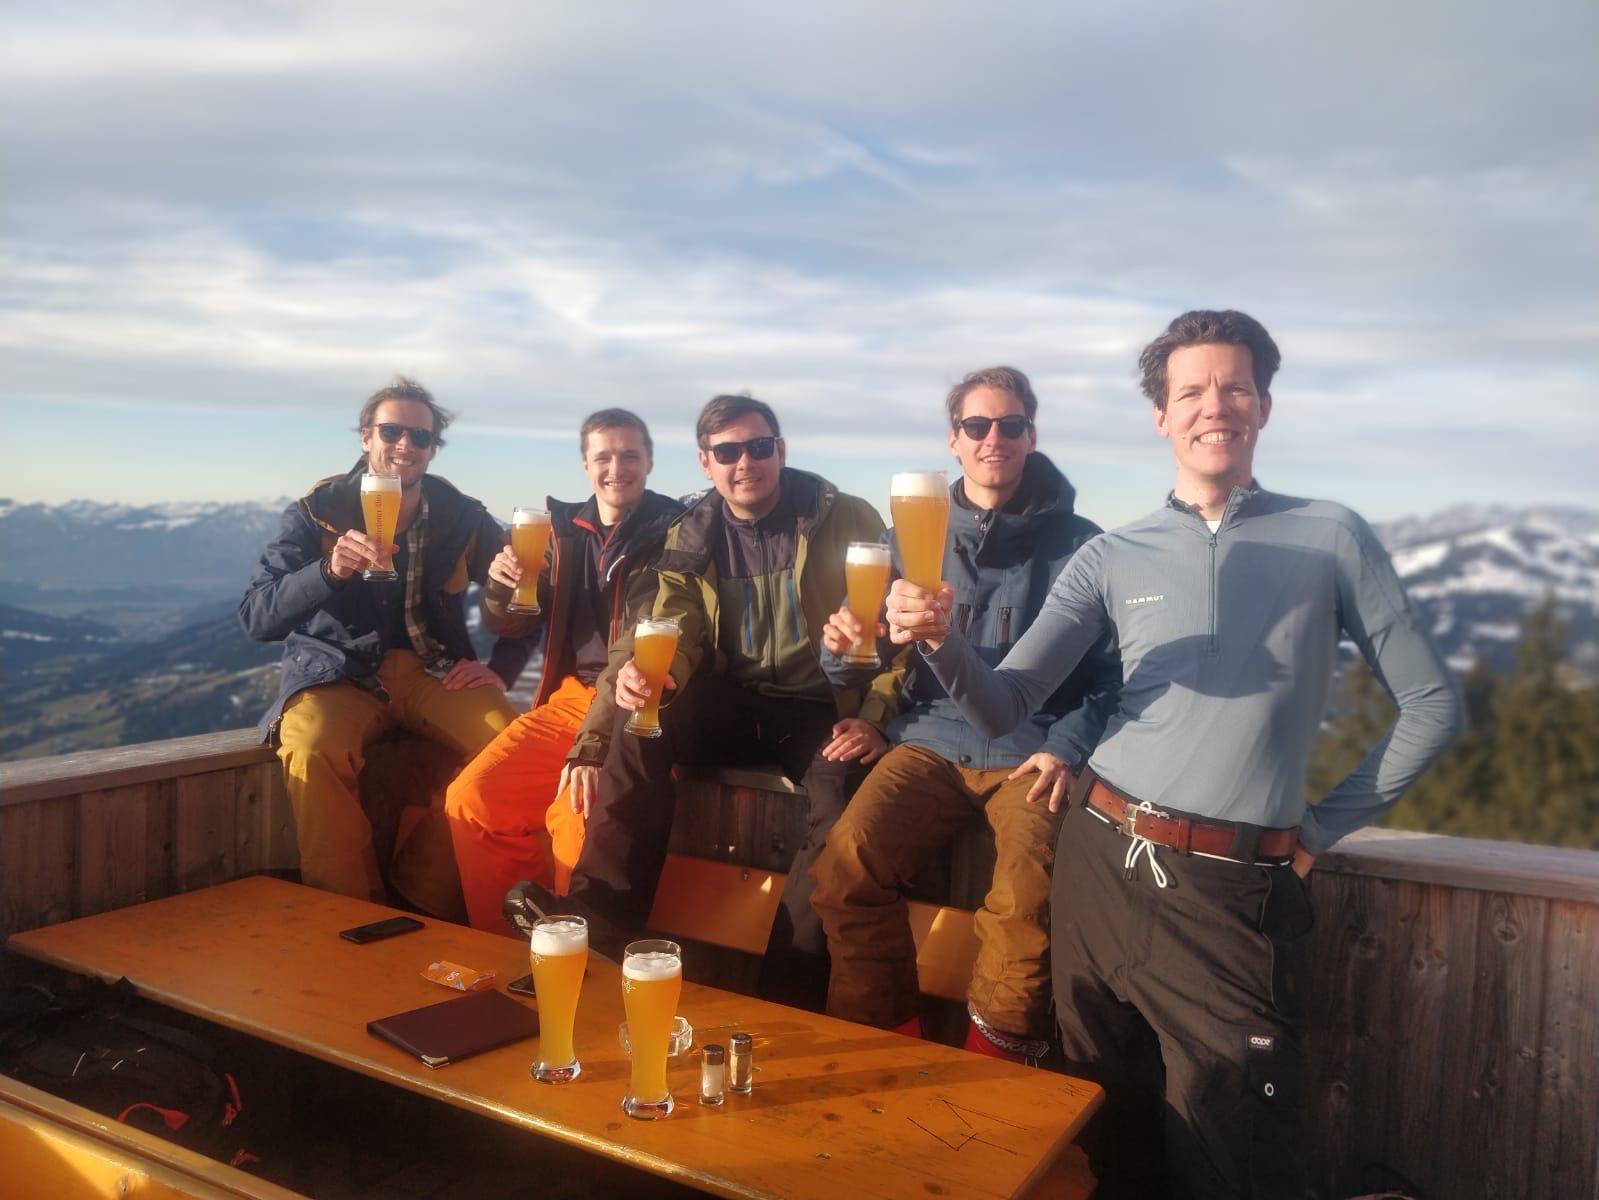 Biertje Alpenrosehutte tijdens Alpex skitochten